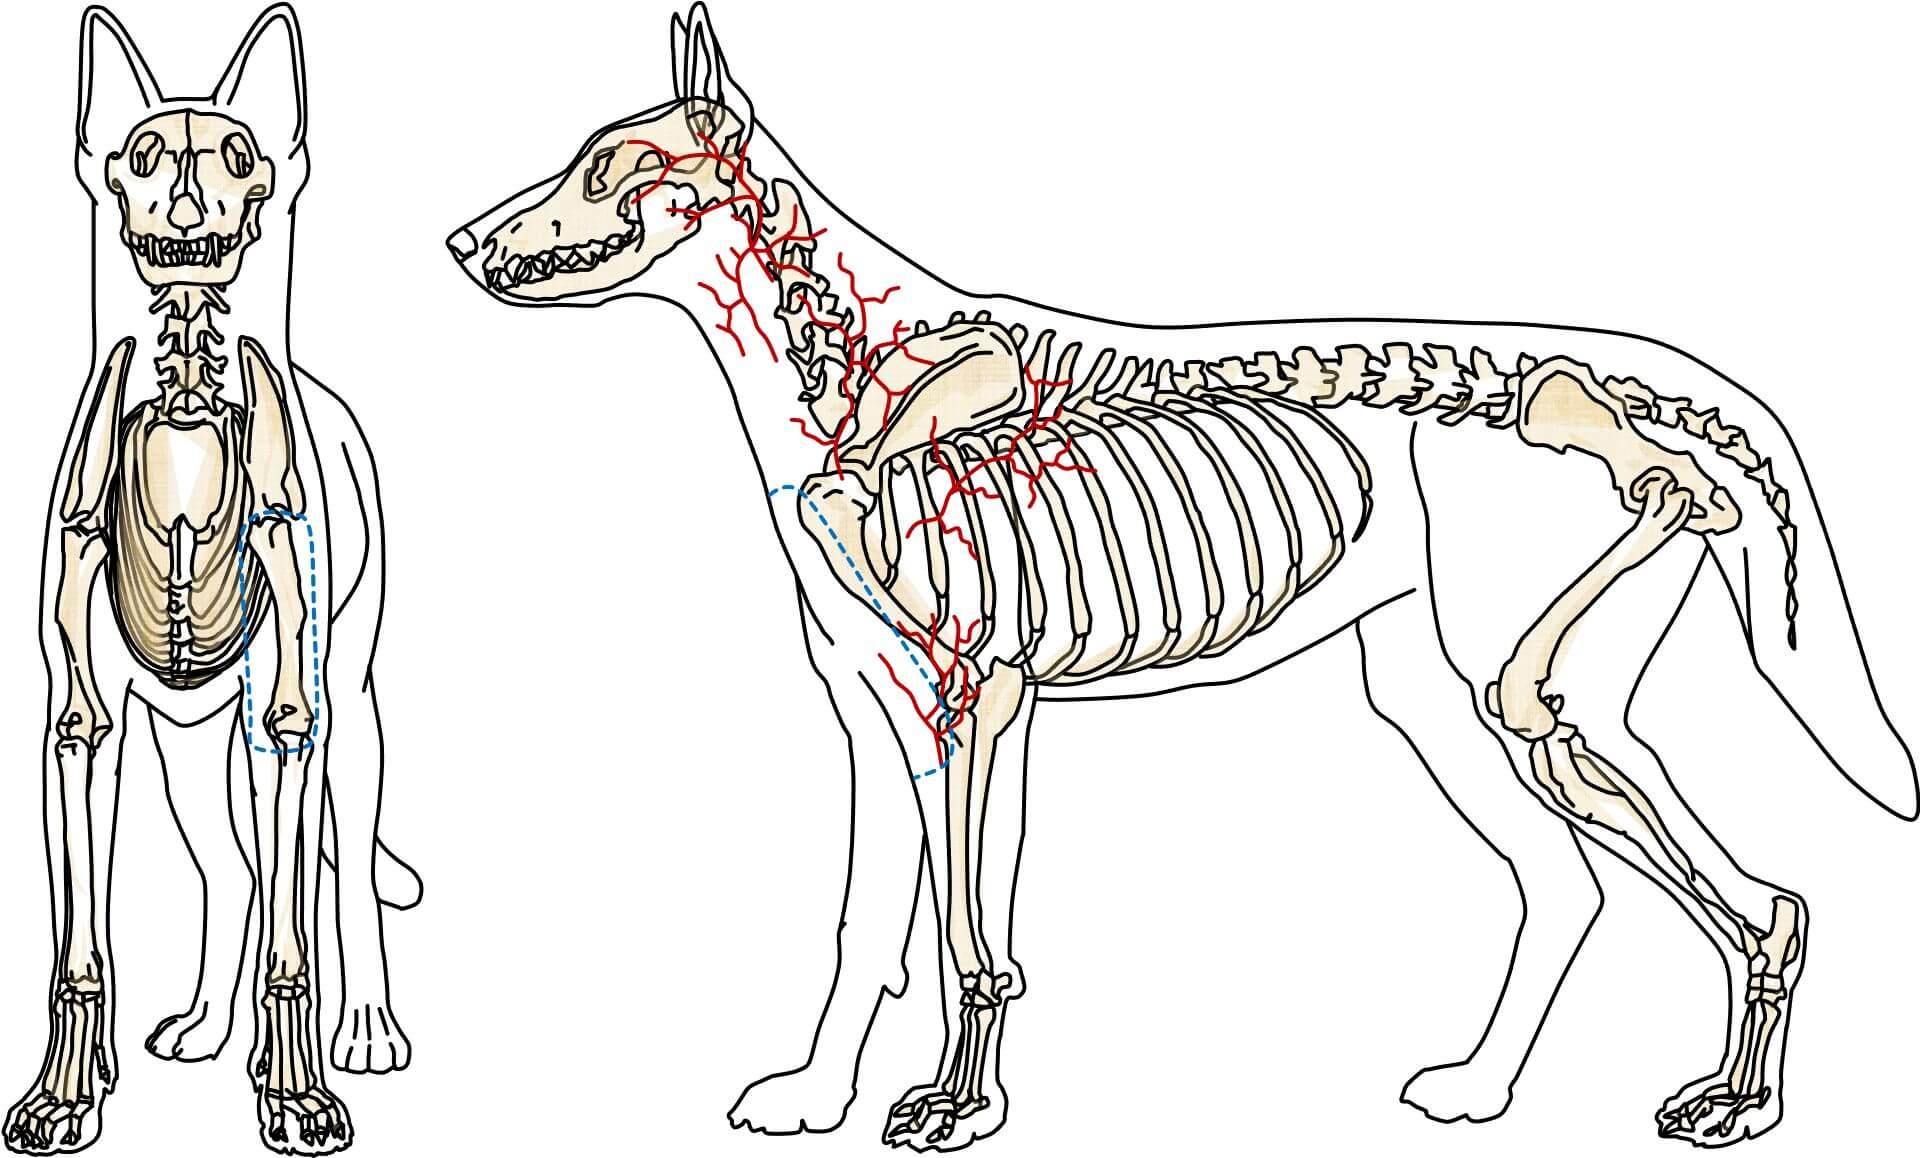 Arterienlappen der Arteria brachialis superficialis (Hund)